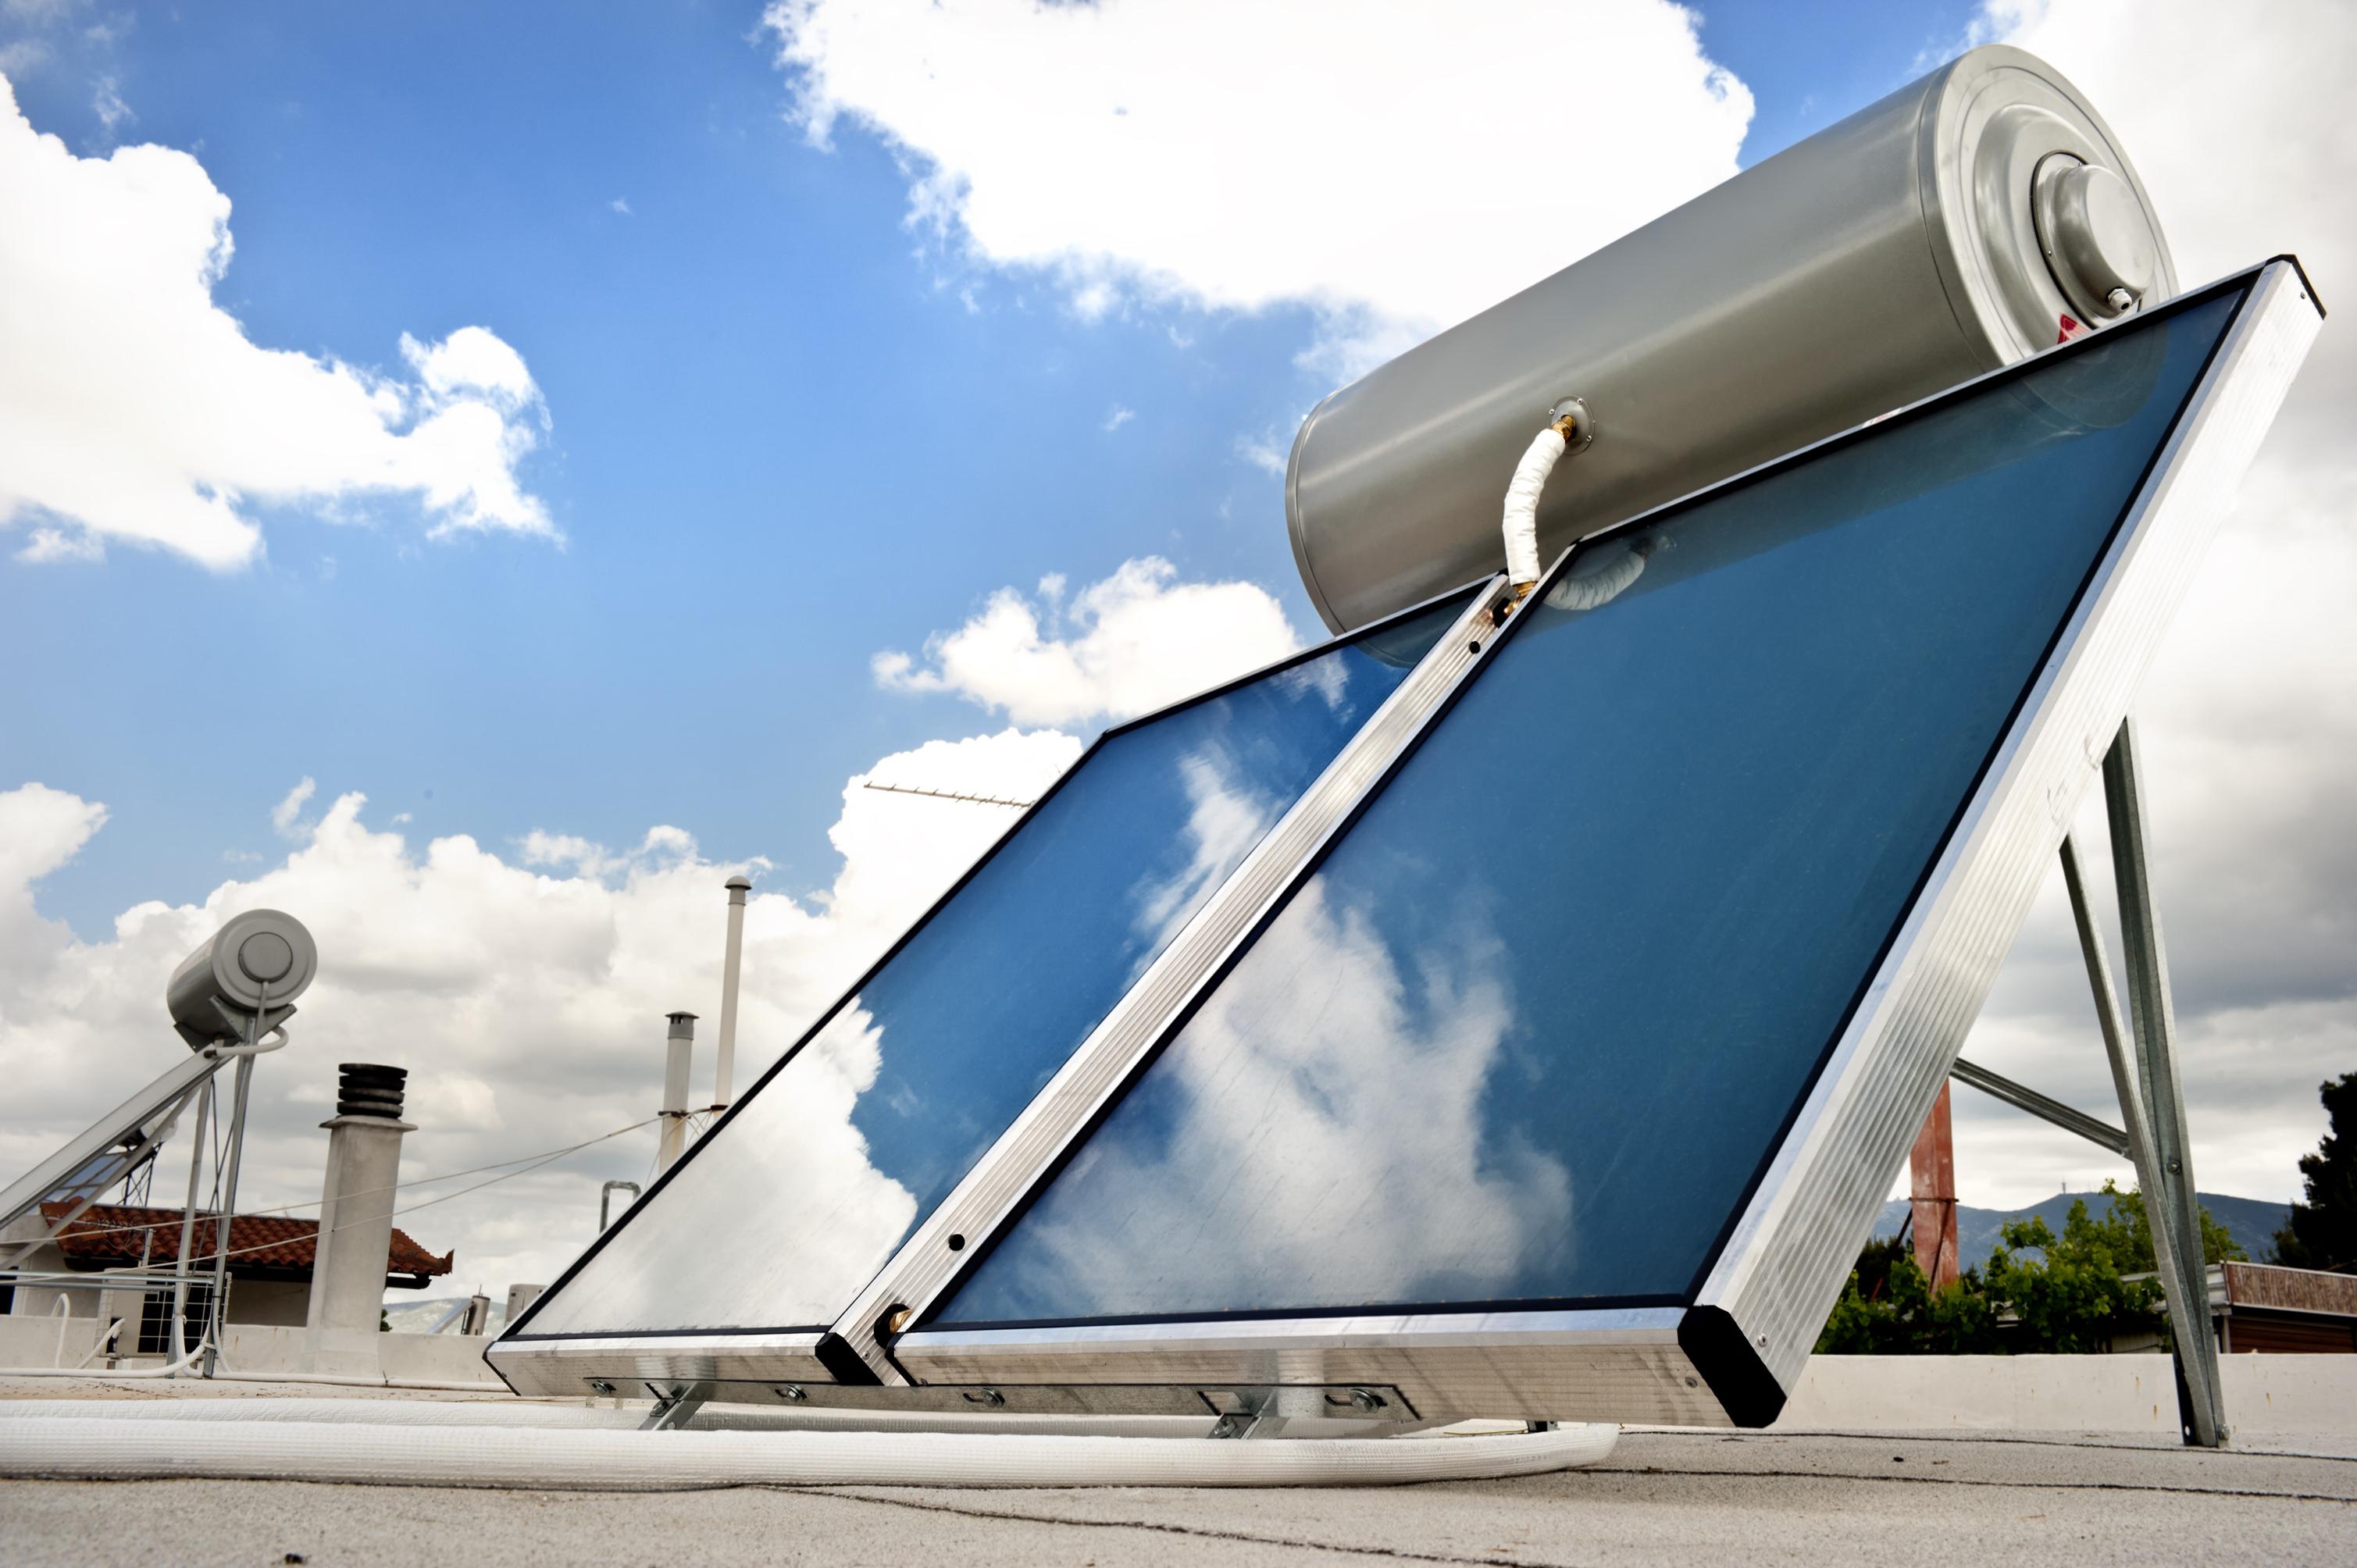 Sistema termosifónico con colectores solares planos para agua caliente sanitaria en un fraccionamiento residencial en Brasil.